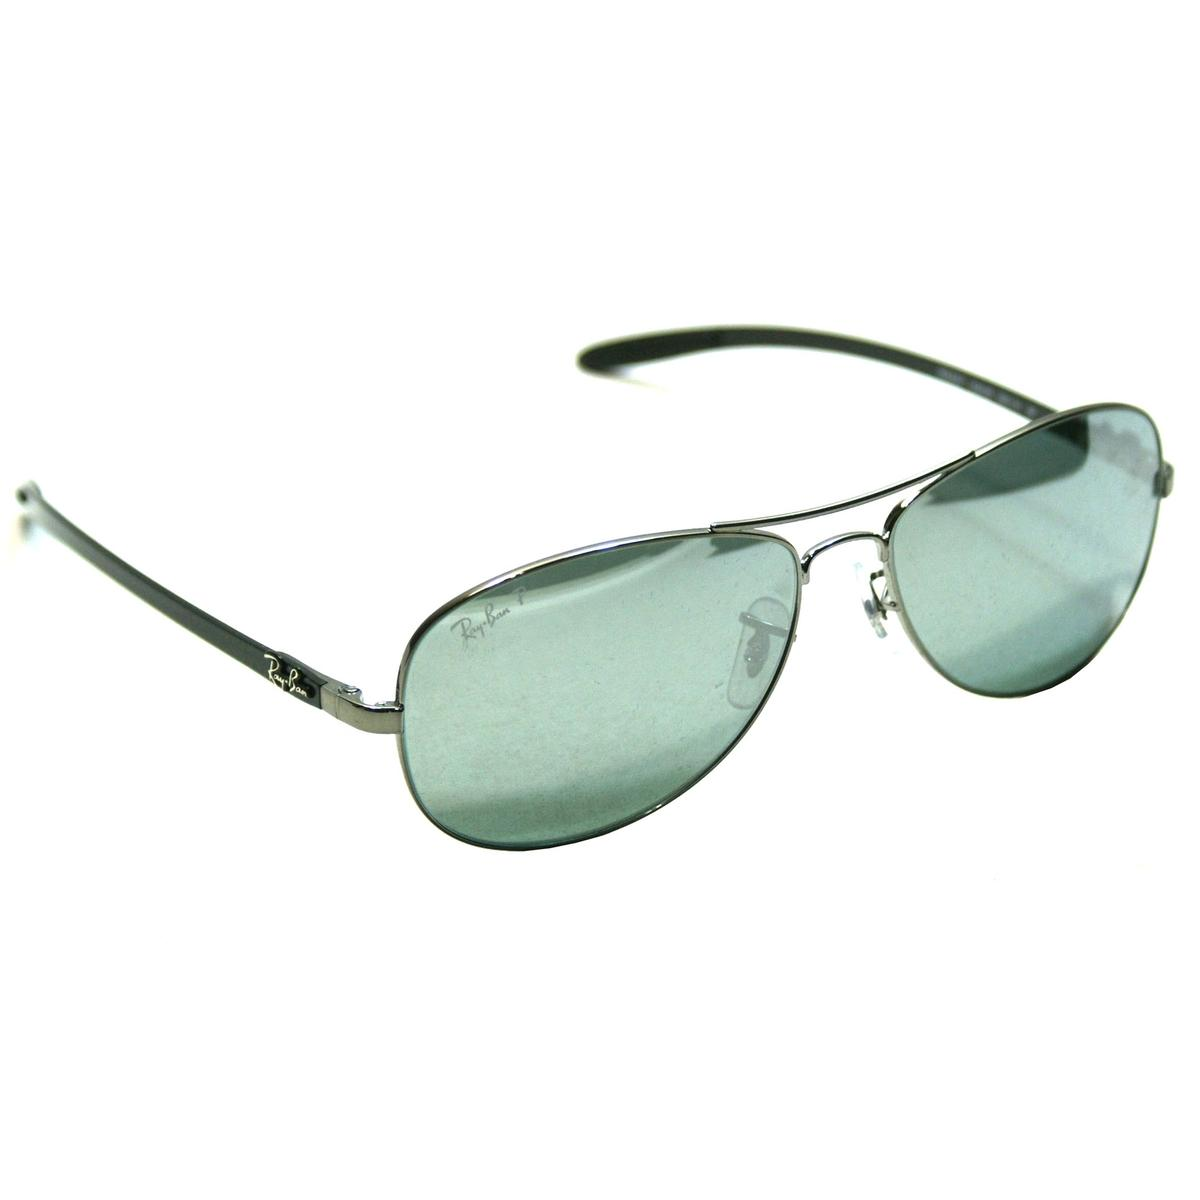 ray ban rb8301 tech sunglasses arista frame grey mirror